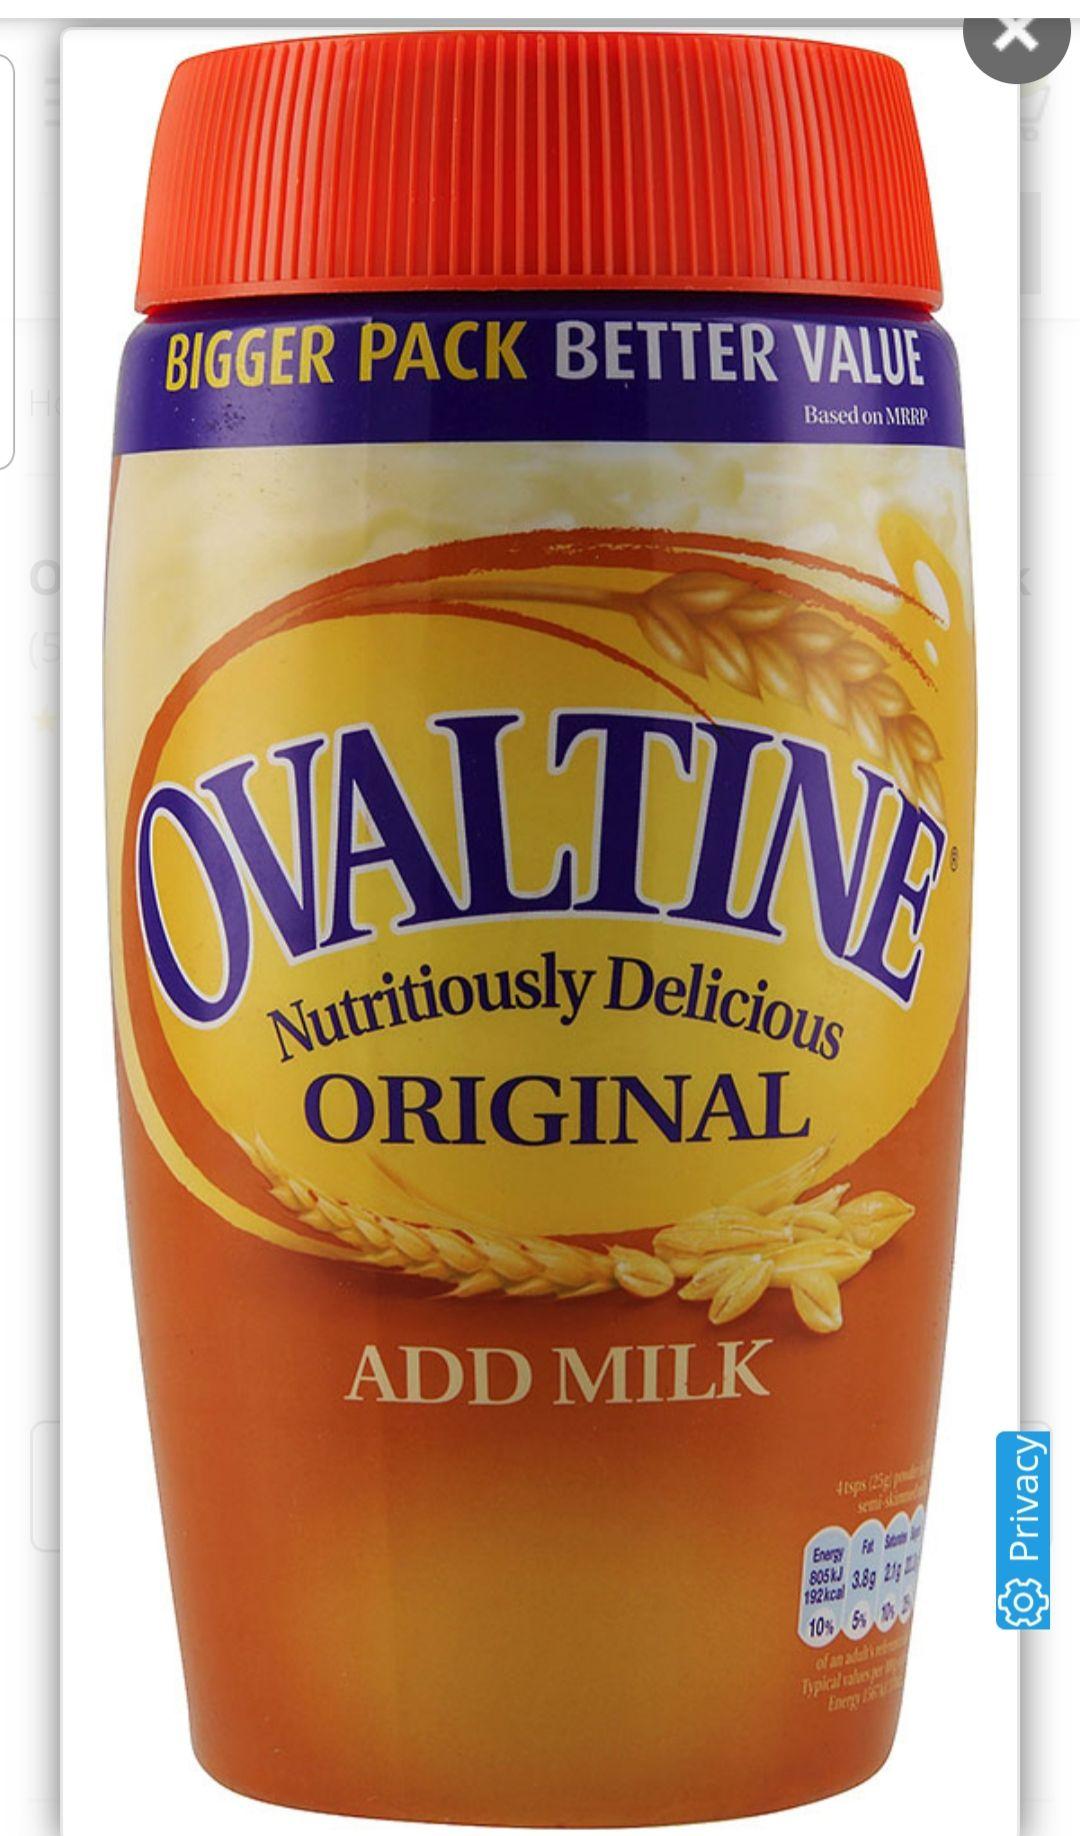 Ovaltine 500g - £3.49 in lidl